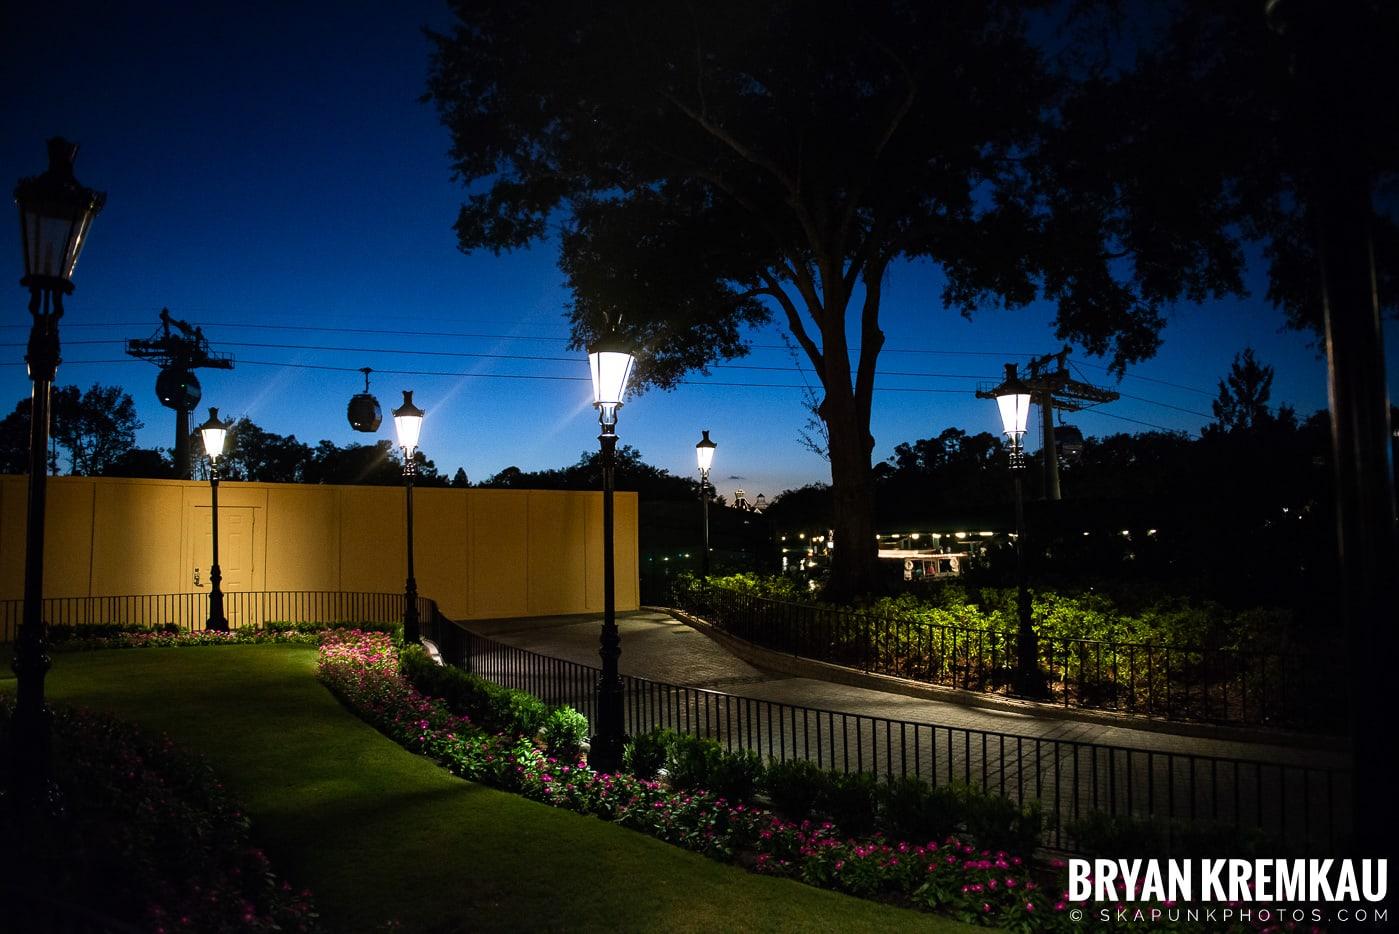 Walt Disney World Vacation: Day 4 (Epcot) October 2nd 2019 (18)